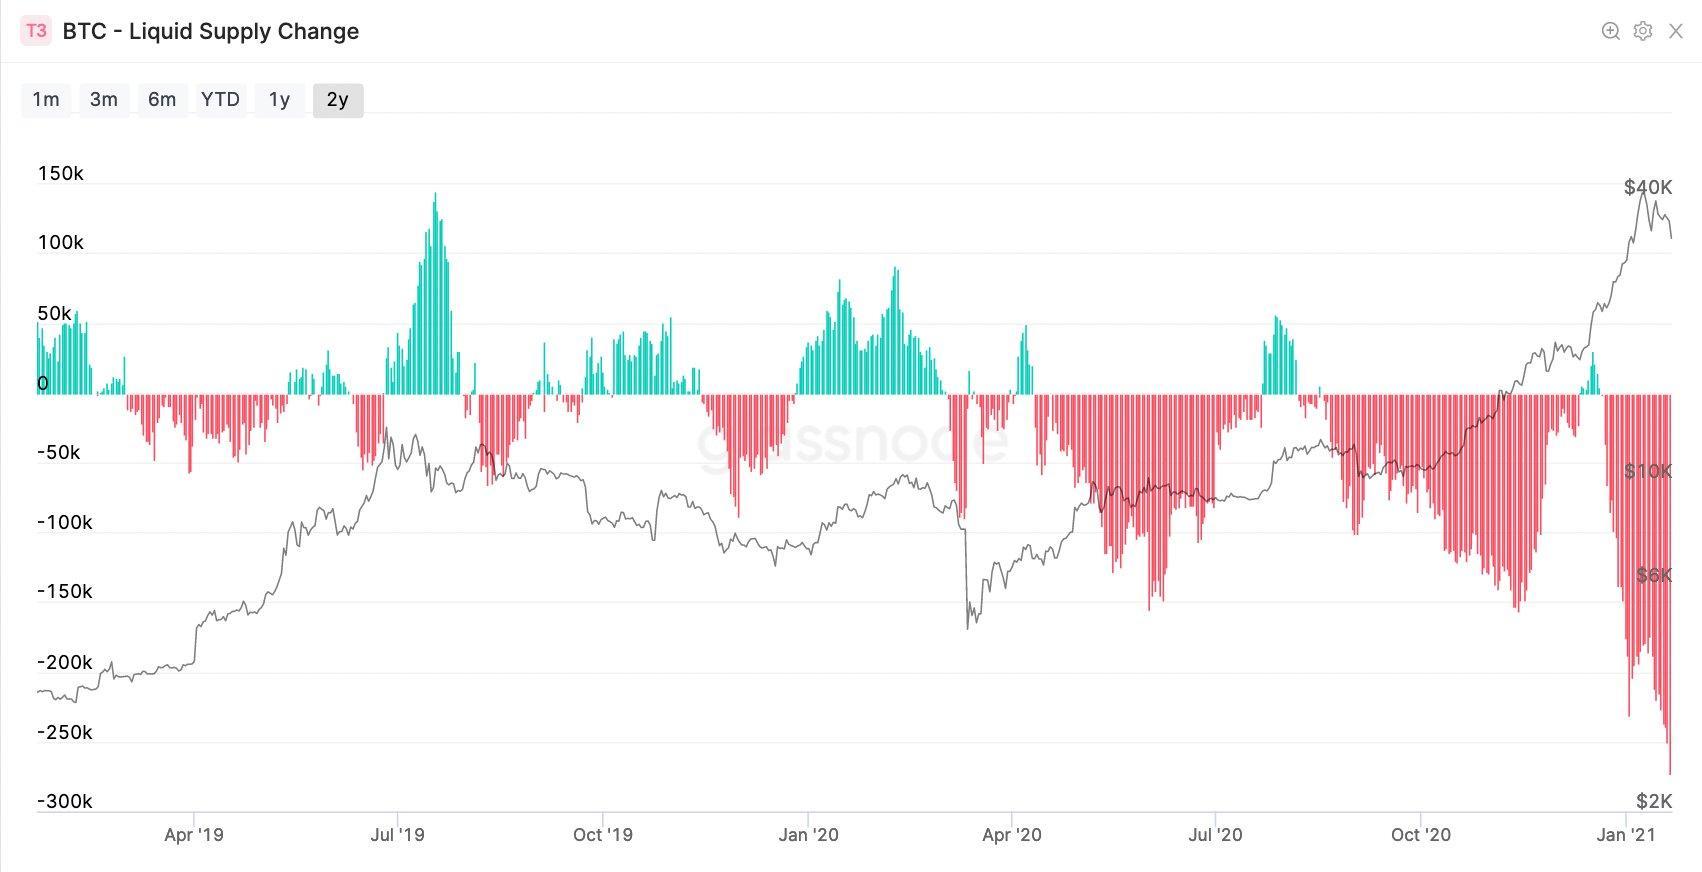 bitcoin peak value